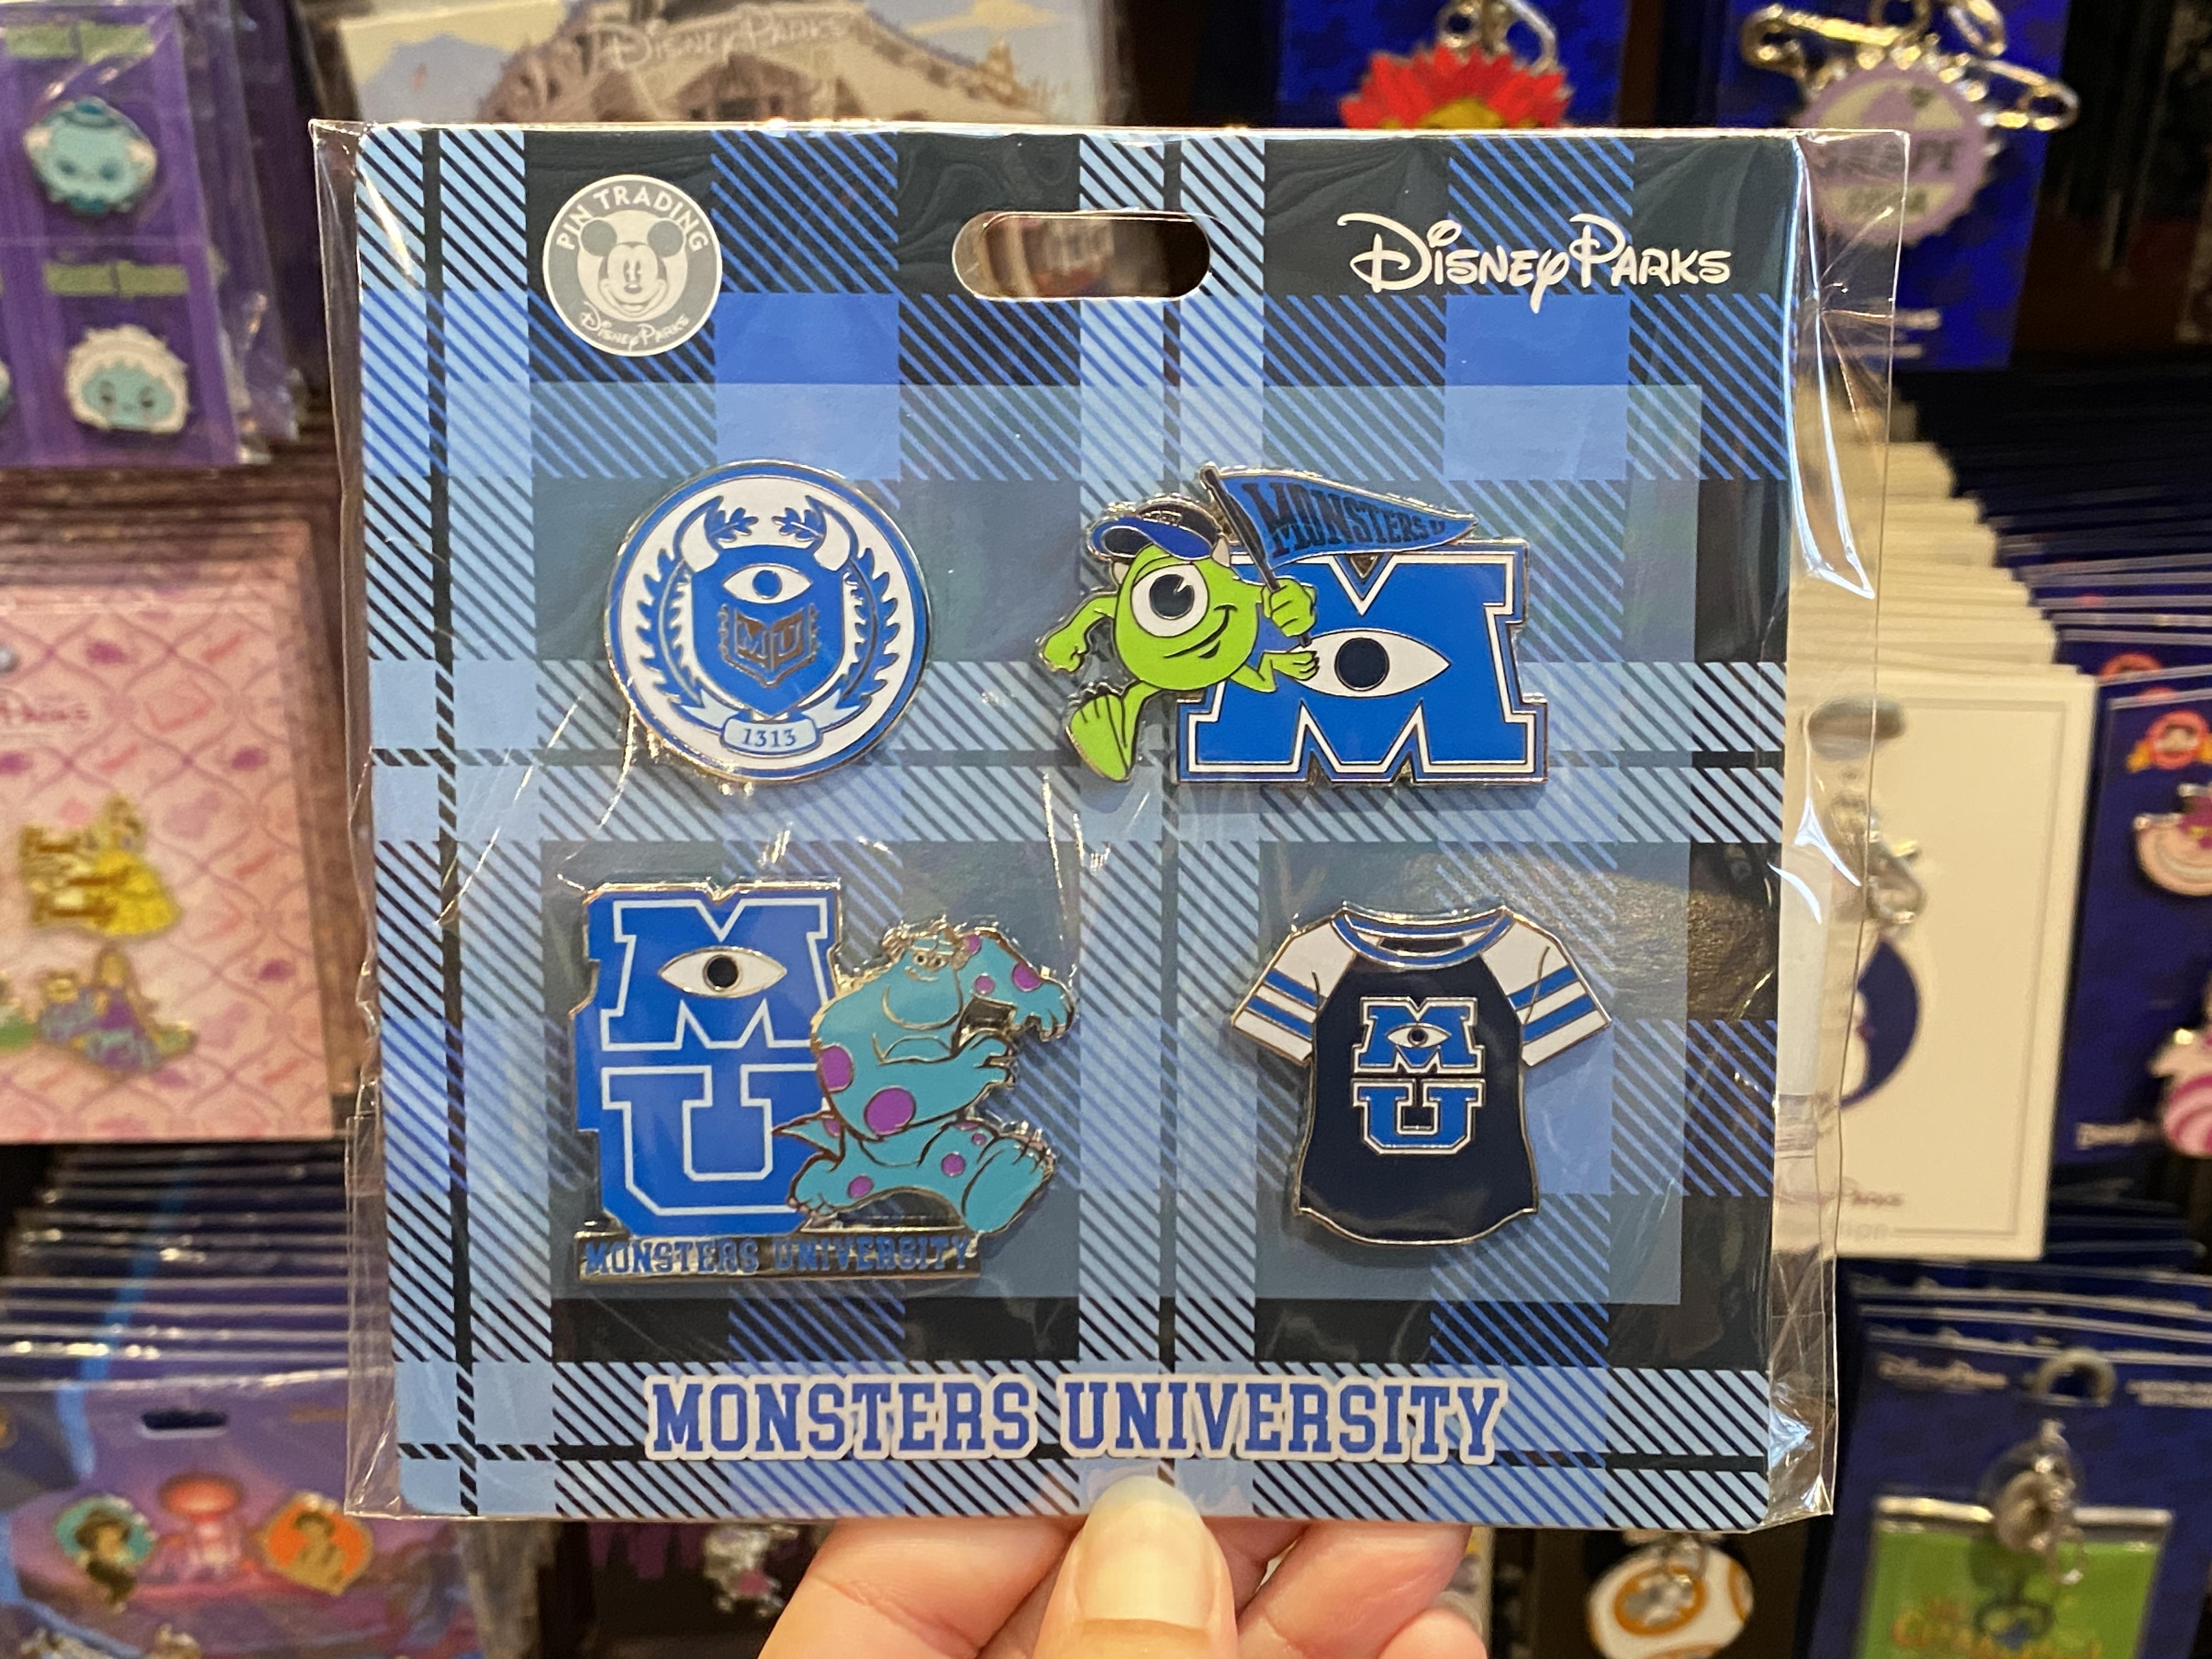 Monsters university pin pack